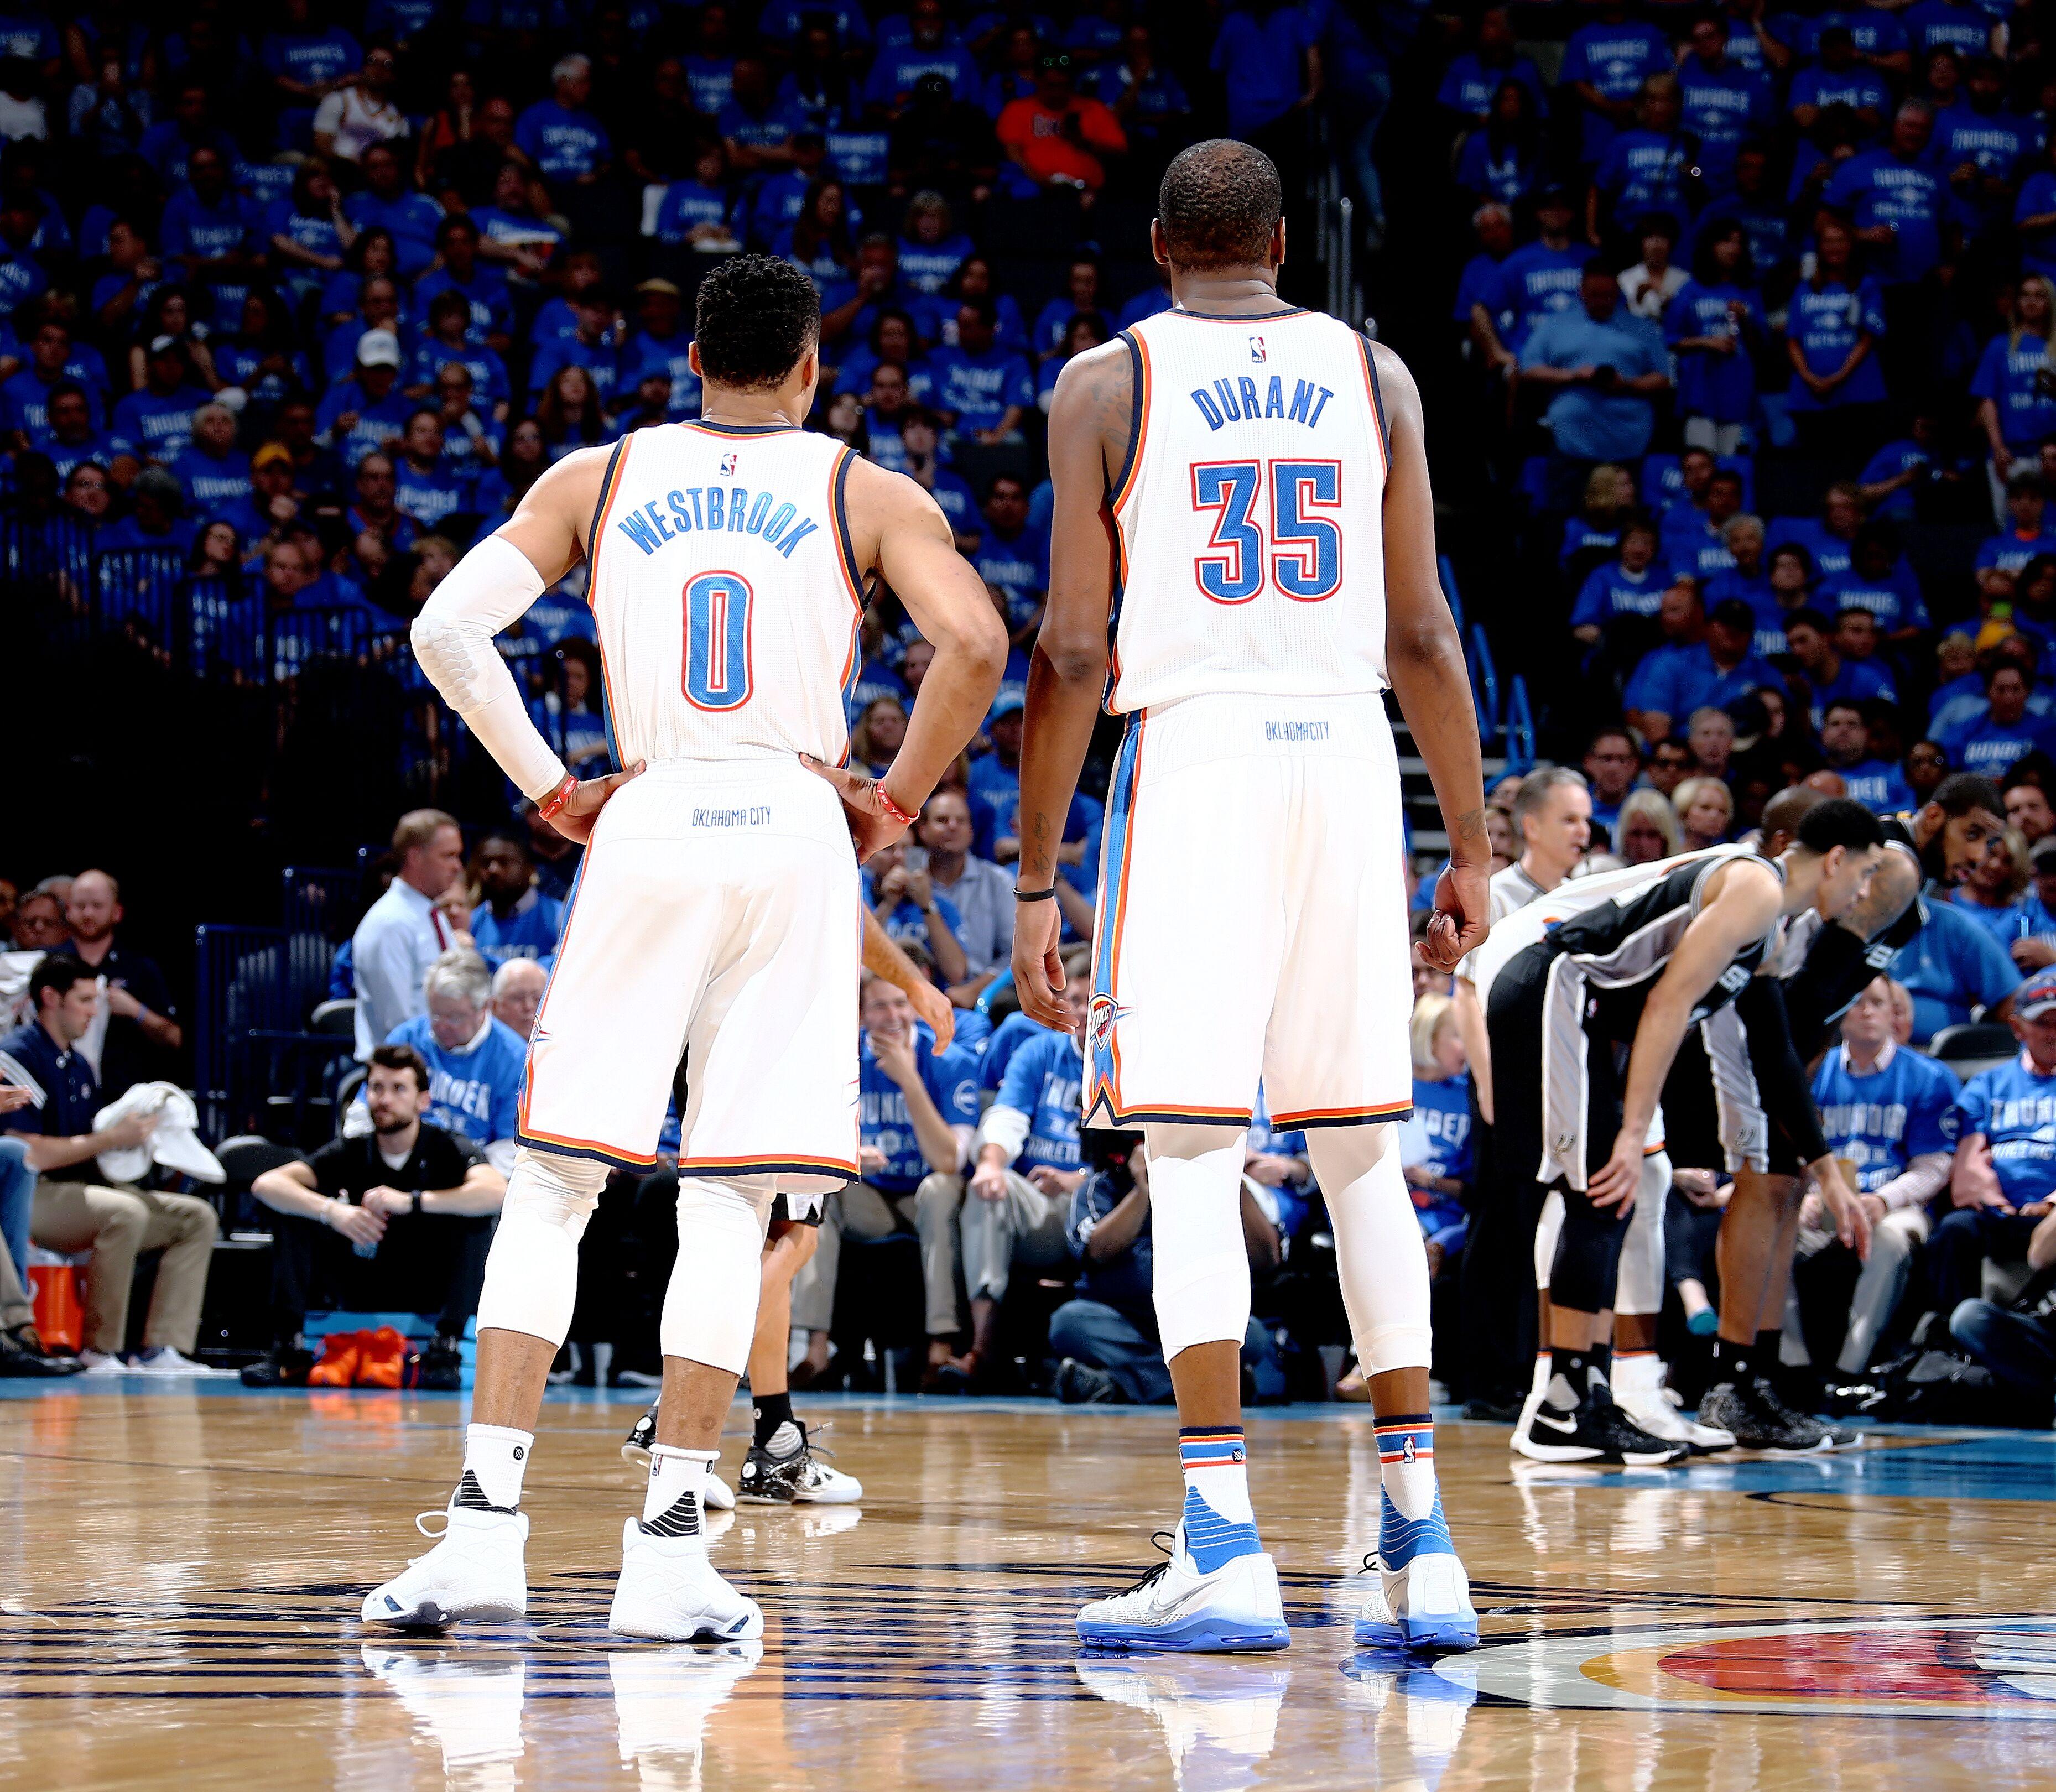 Oklahoma City Thunder: Top Scorers All-time